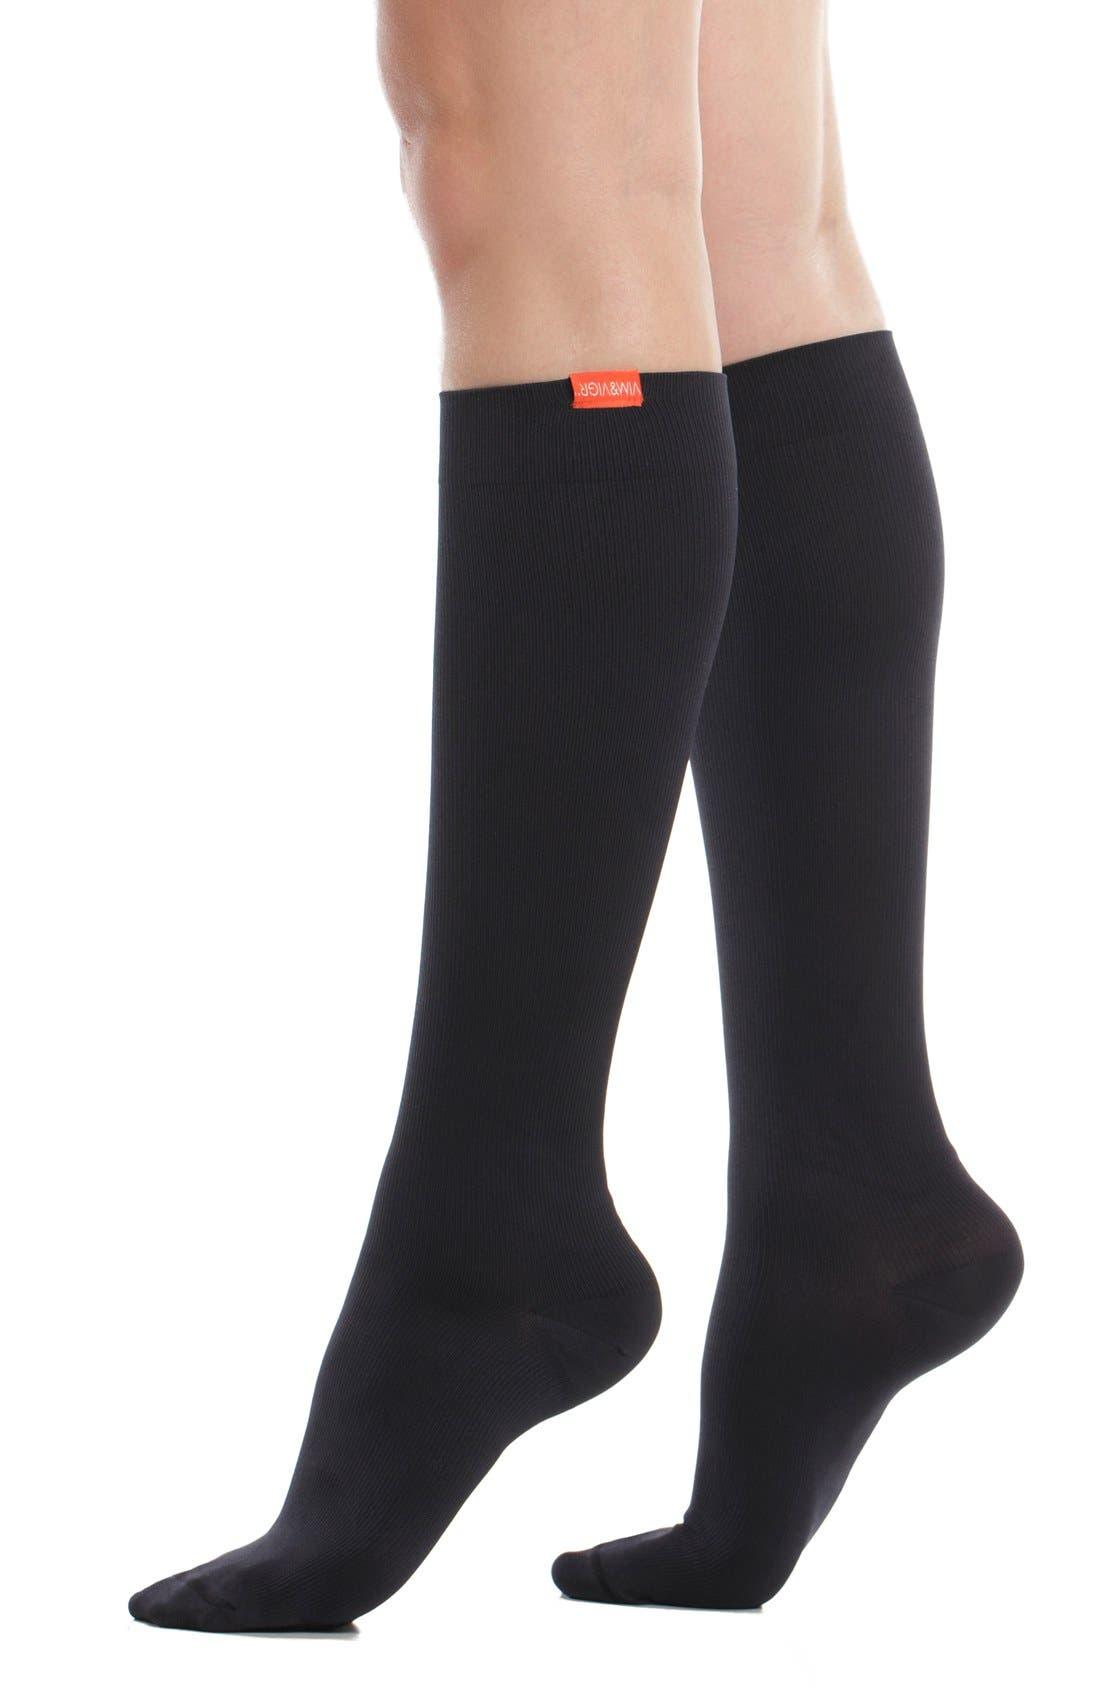 Solid Graduated Compression Trouser Socks,                         Main,                         color, BLACK